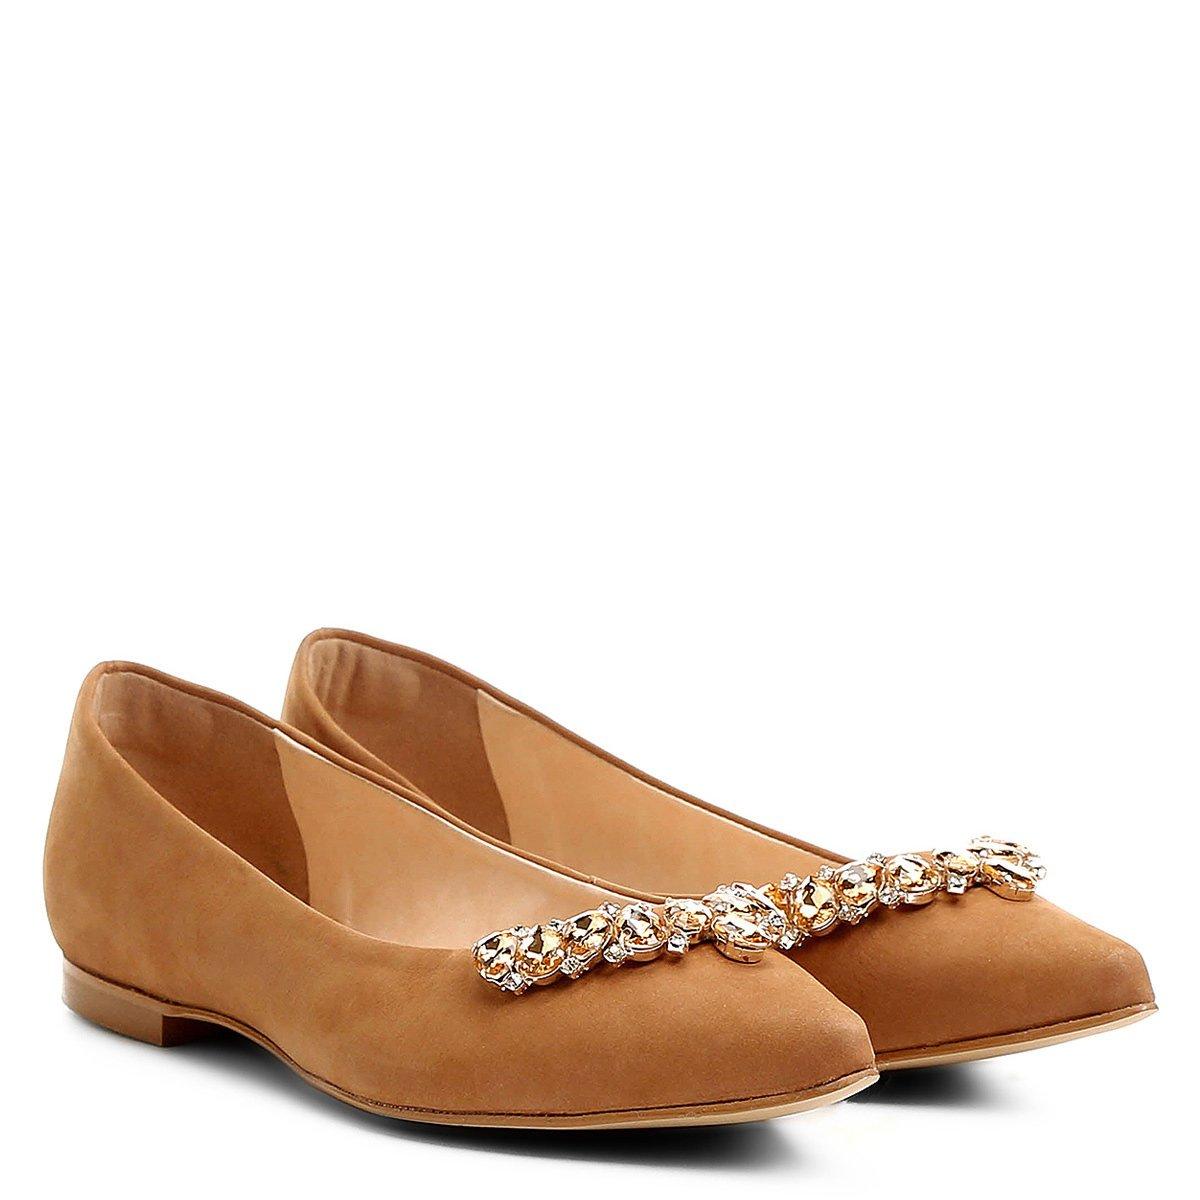 Feminina Caramelo Caramelo Sapatilha Couro Feminina Sapatilha Shoestock Pedraria Sapatilha Pedraria Couro Shoestock wxvxtq7BT